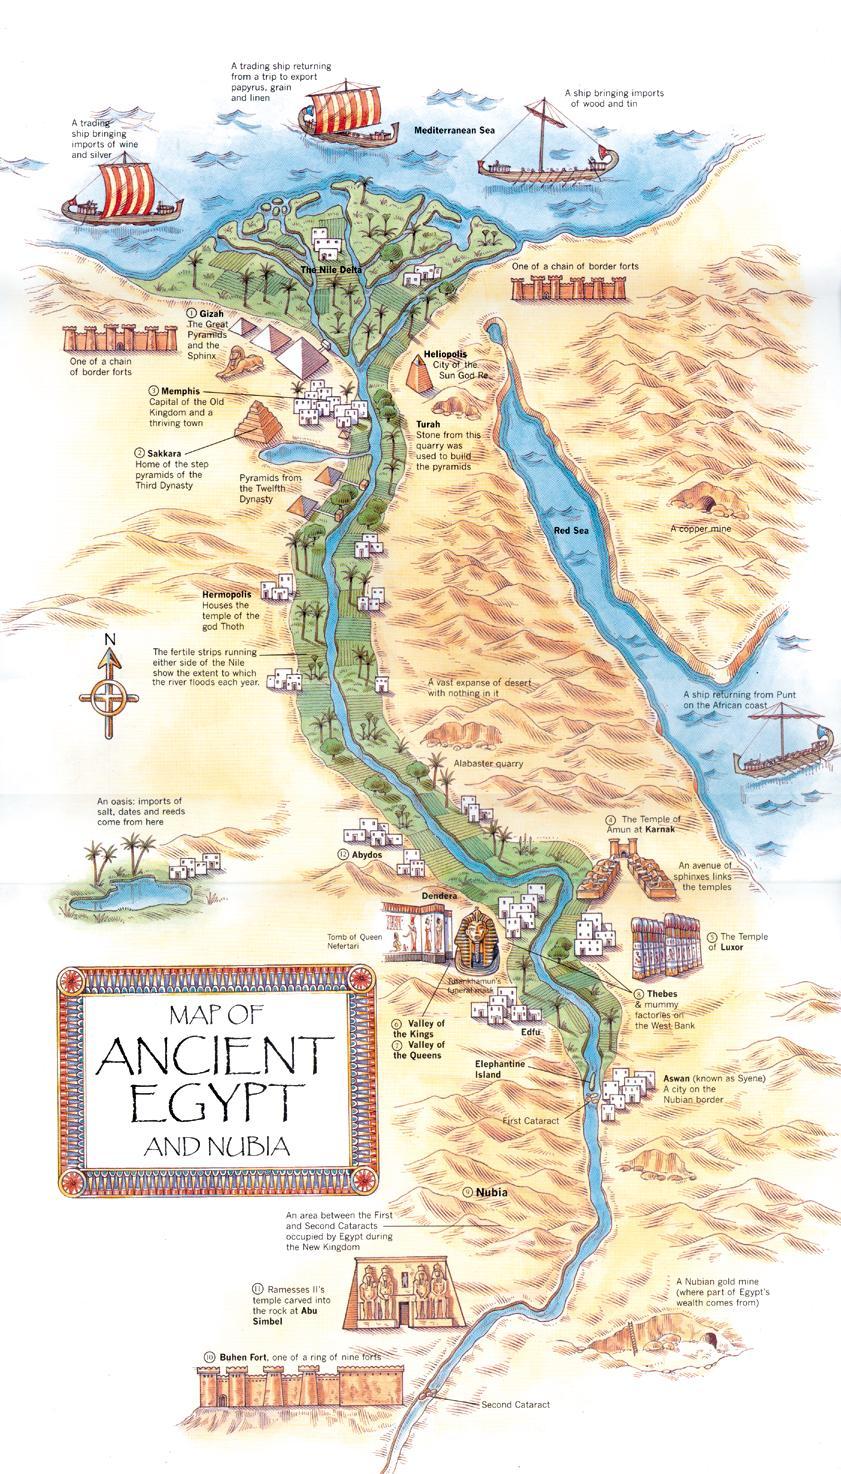 Mapa Del Antiguo Egipto Blanco Y Negro.The Pink Binnacle Egipto